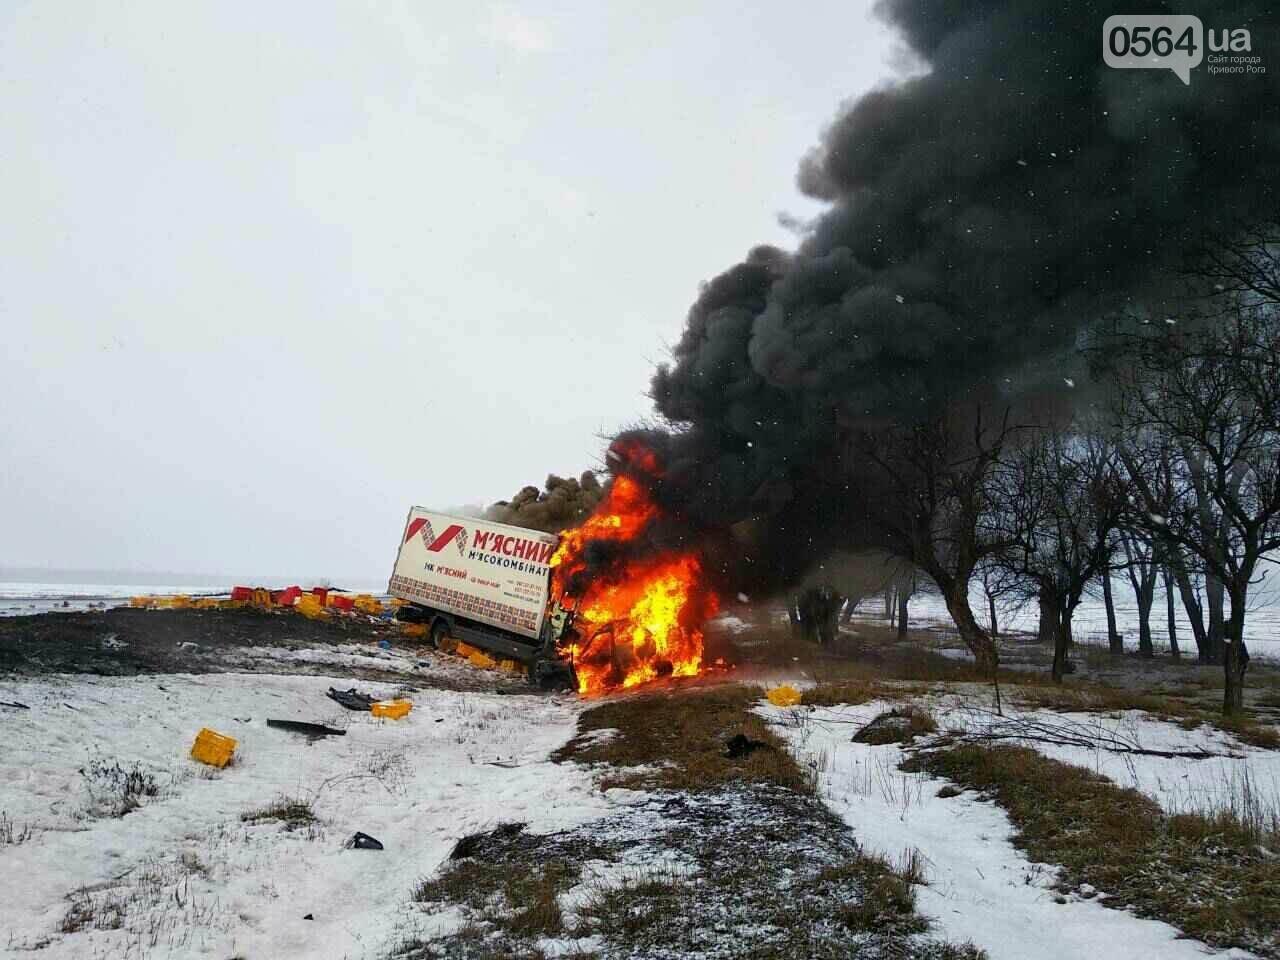 На Днепропетровщине грузовик столкнулся с легковушкой. 3 человека погибли (ФОТО), фото-1